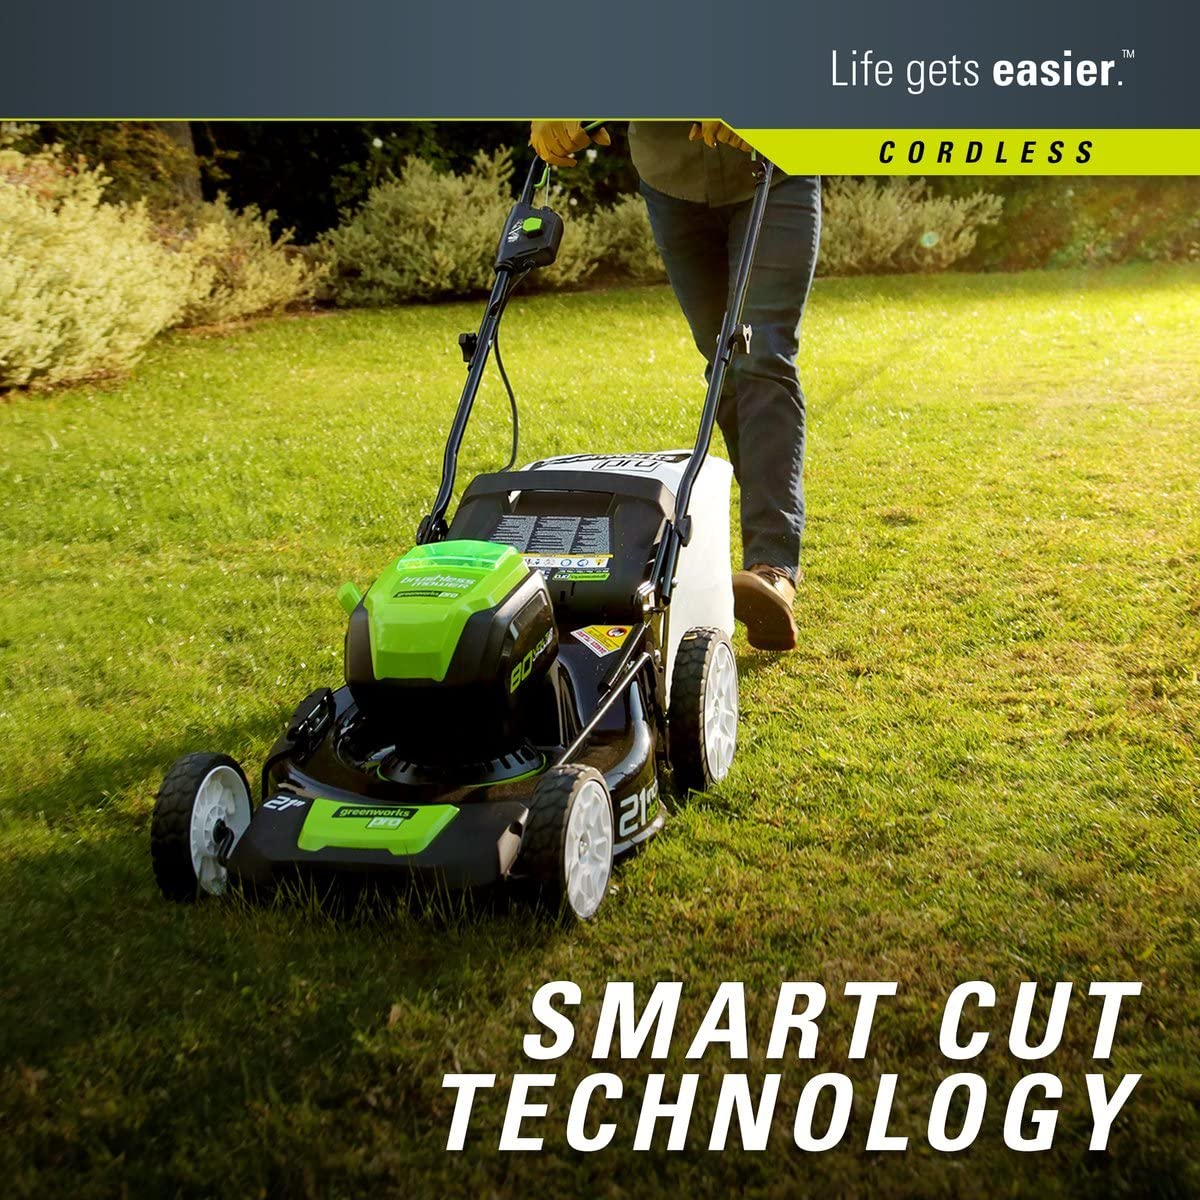 Pro Push Cordless Lawn Mower